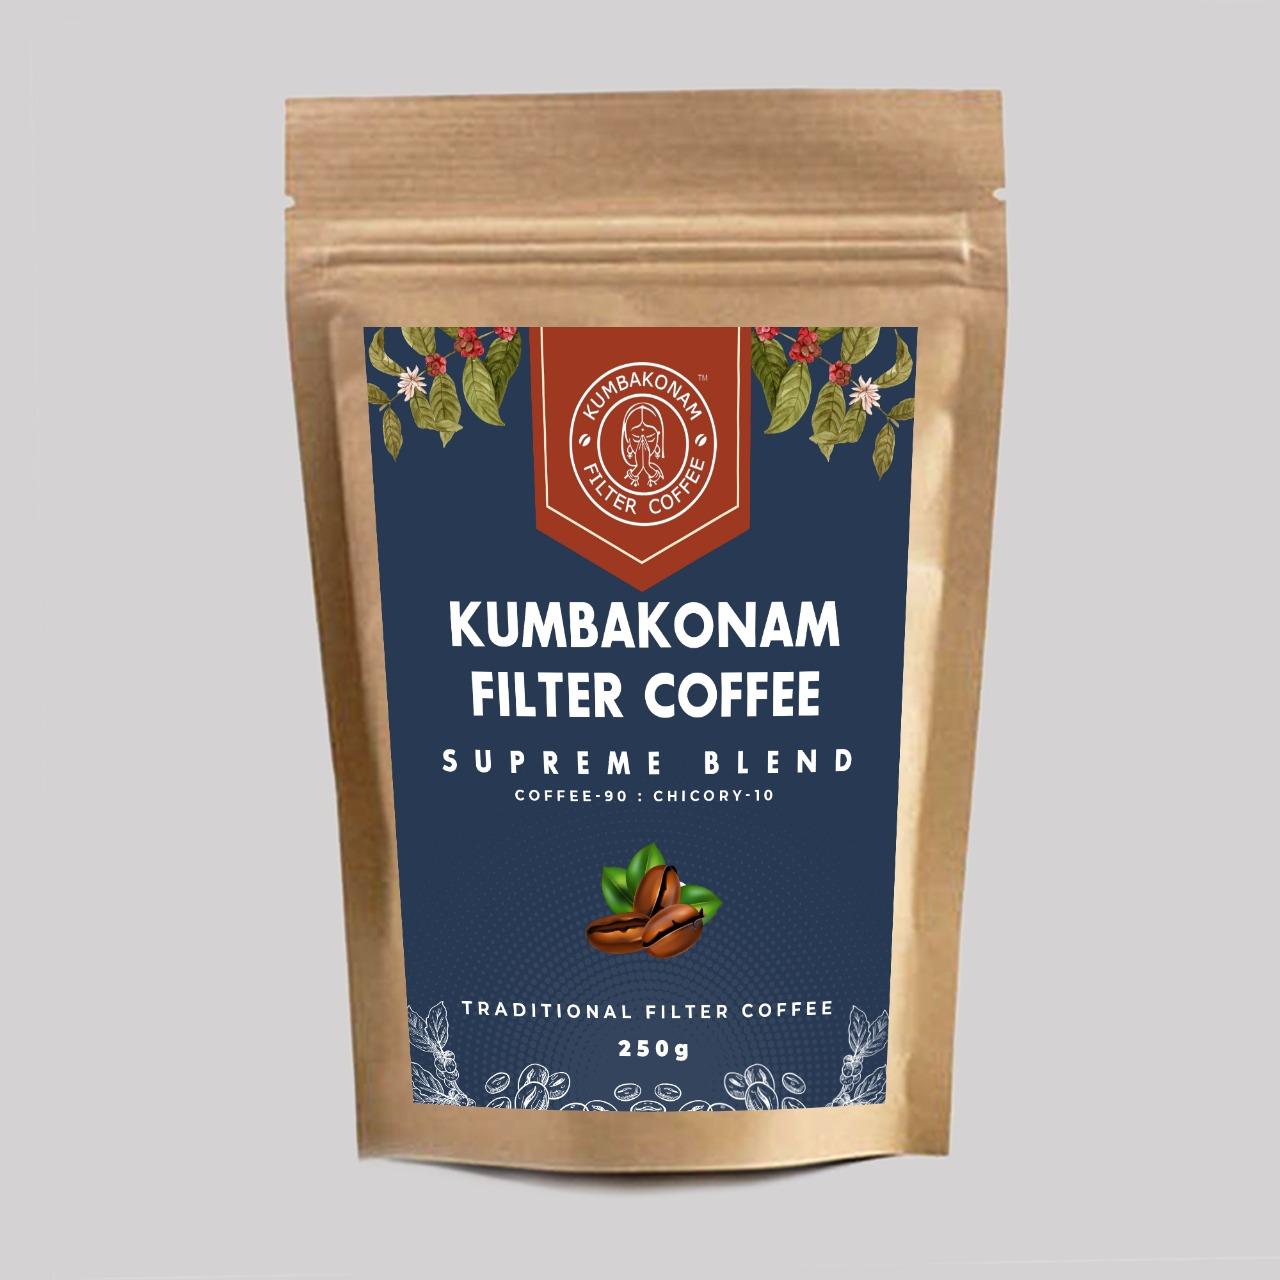 Kumbakonam Filter Coffee